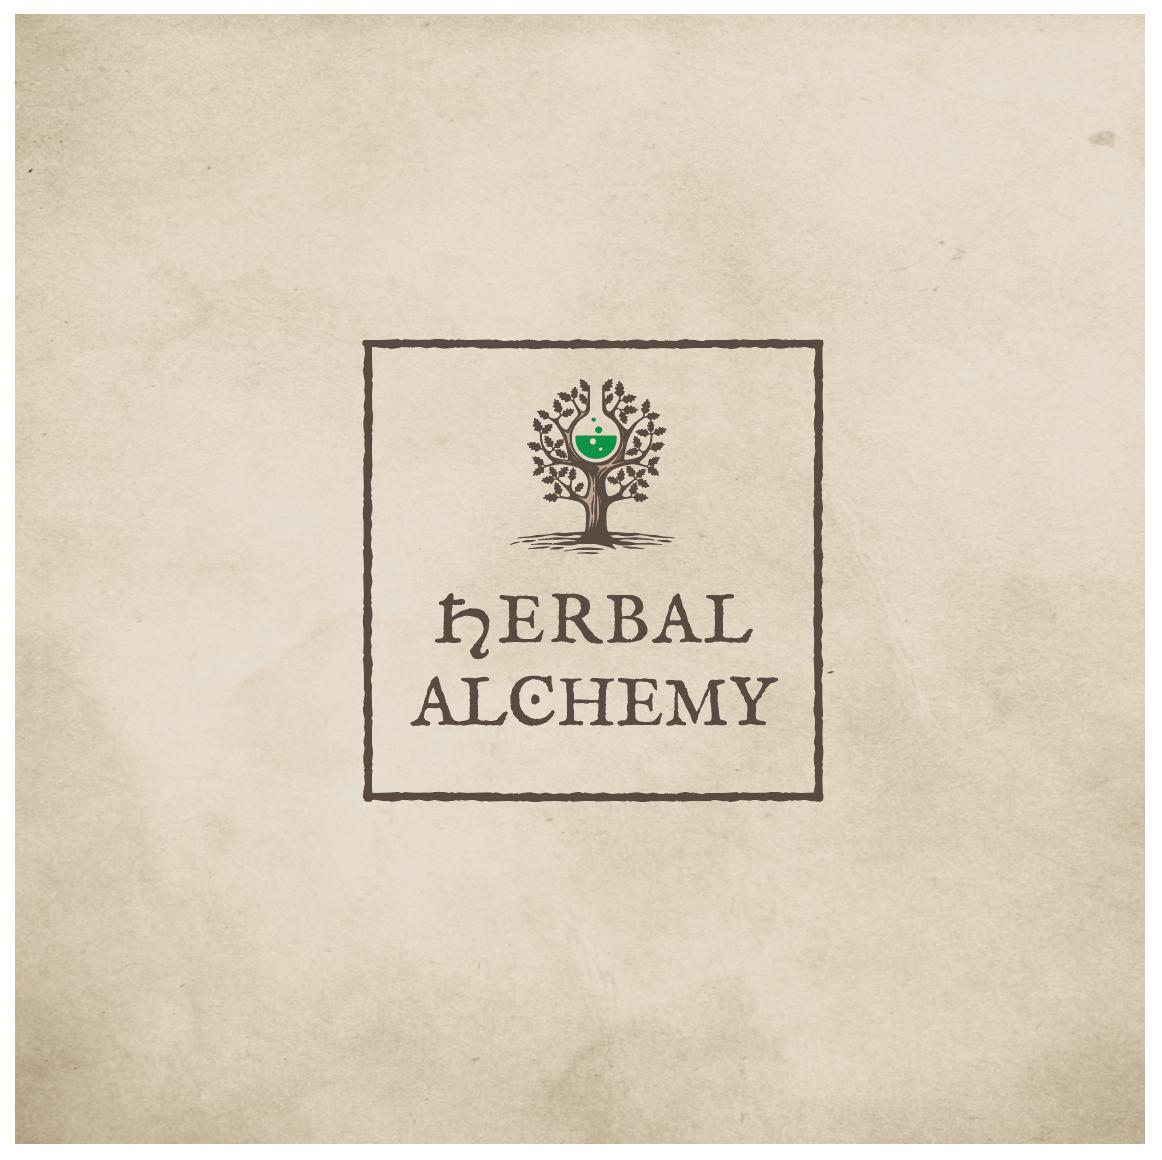 Badass herbalists looking for revolutionary logo